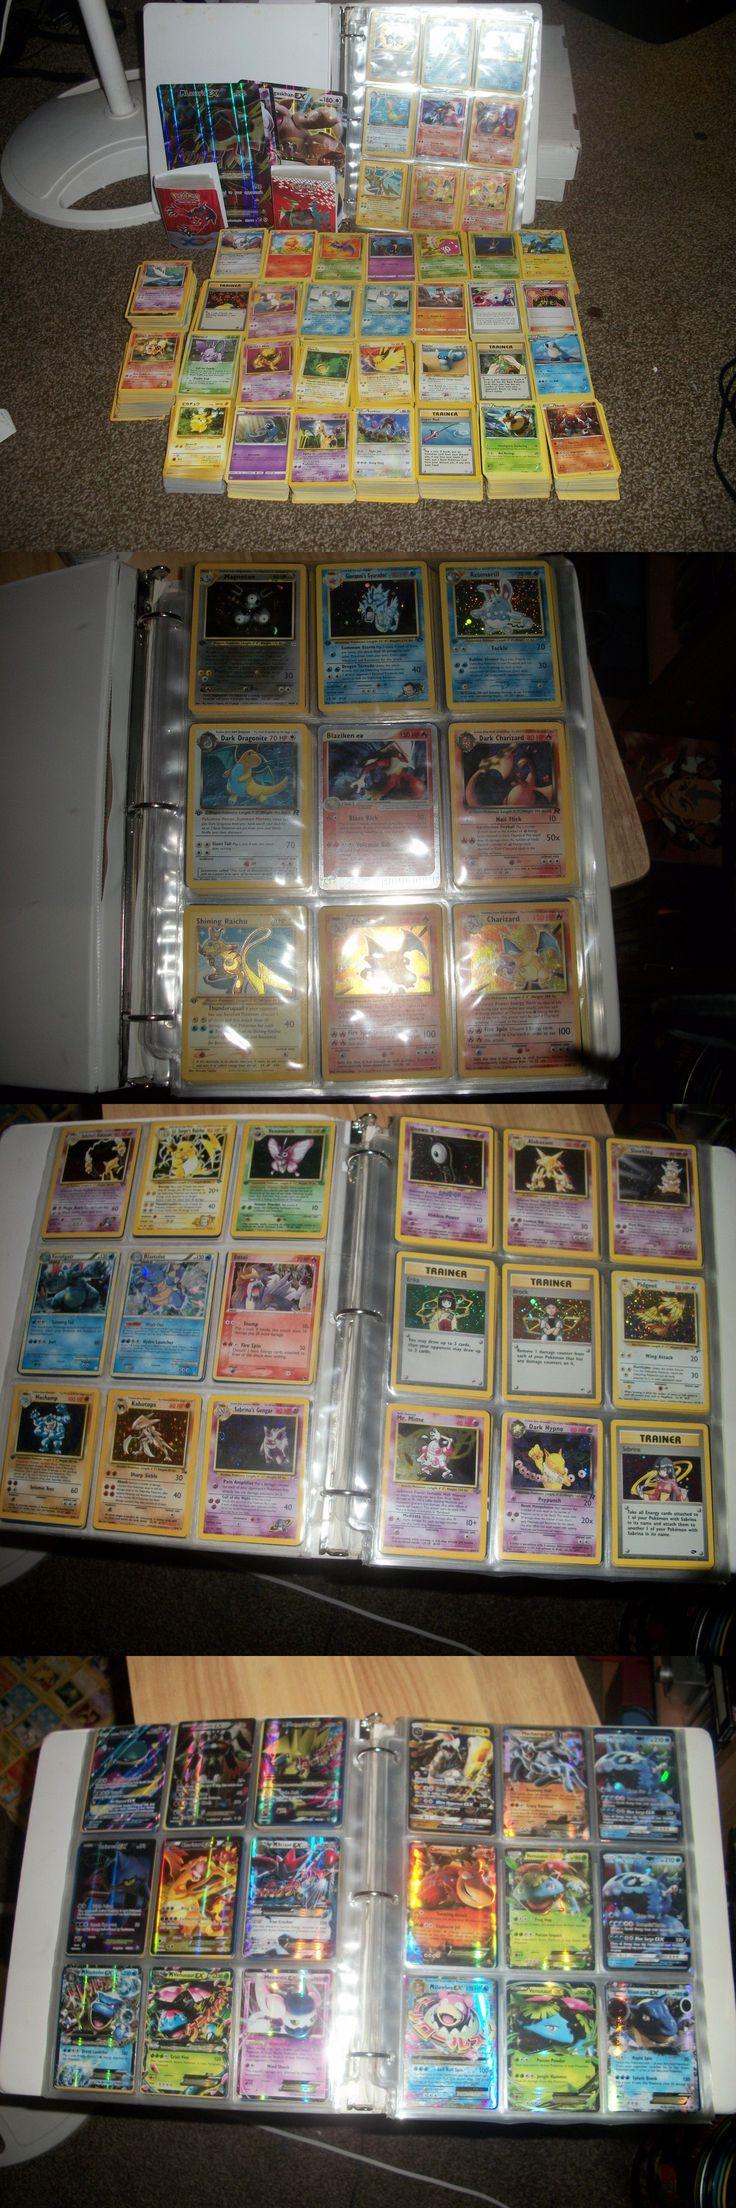 Pok mon Mixed Card Lots 104049: 3000+ Pokemon Lot Shiny Raichu, Base Charizards Old Rare Holos!Shadowless Gx, Ex -> BUY IT NOW ONLY: $1000 on eBay!